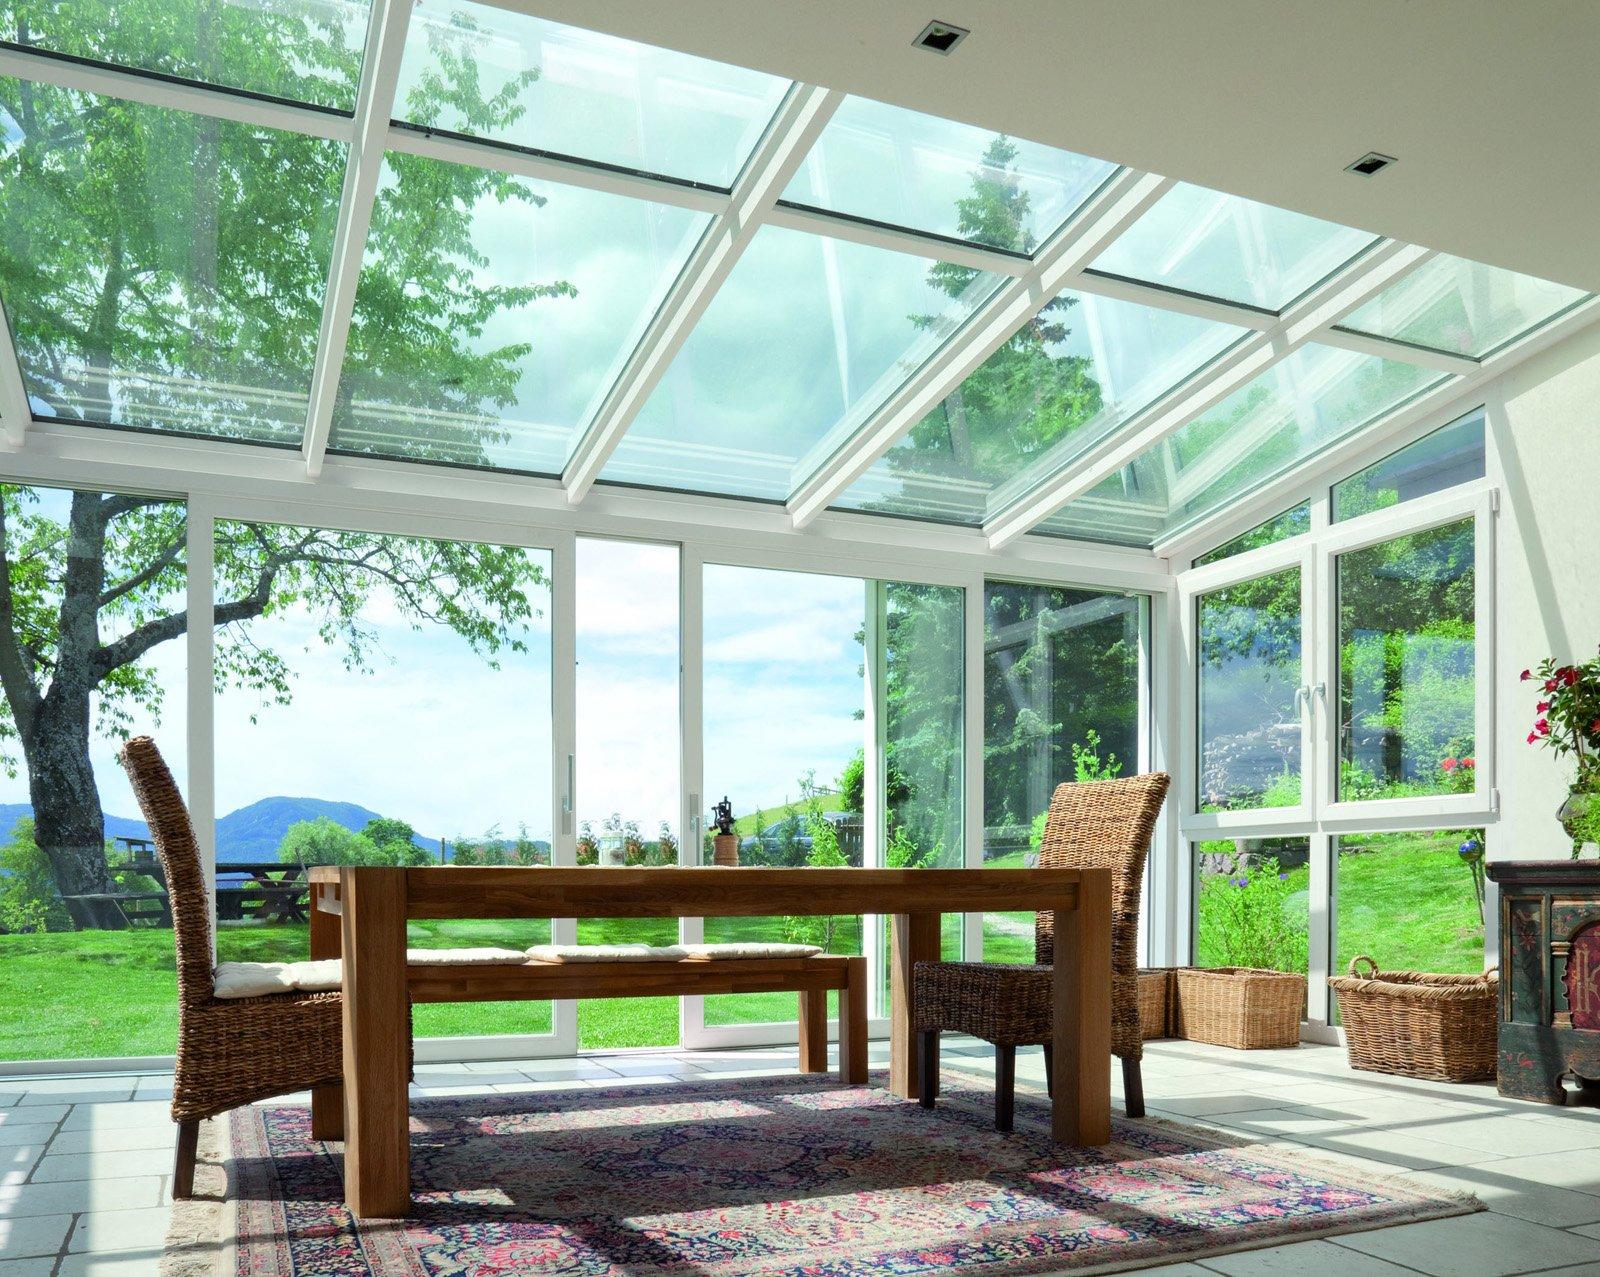 Finestre tipi di apertura cose di casa - Finestre a soffitto ...